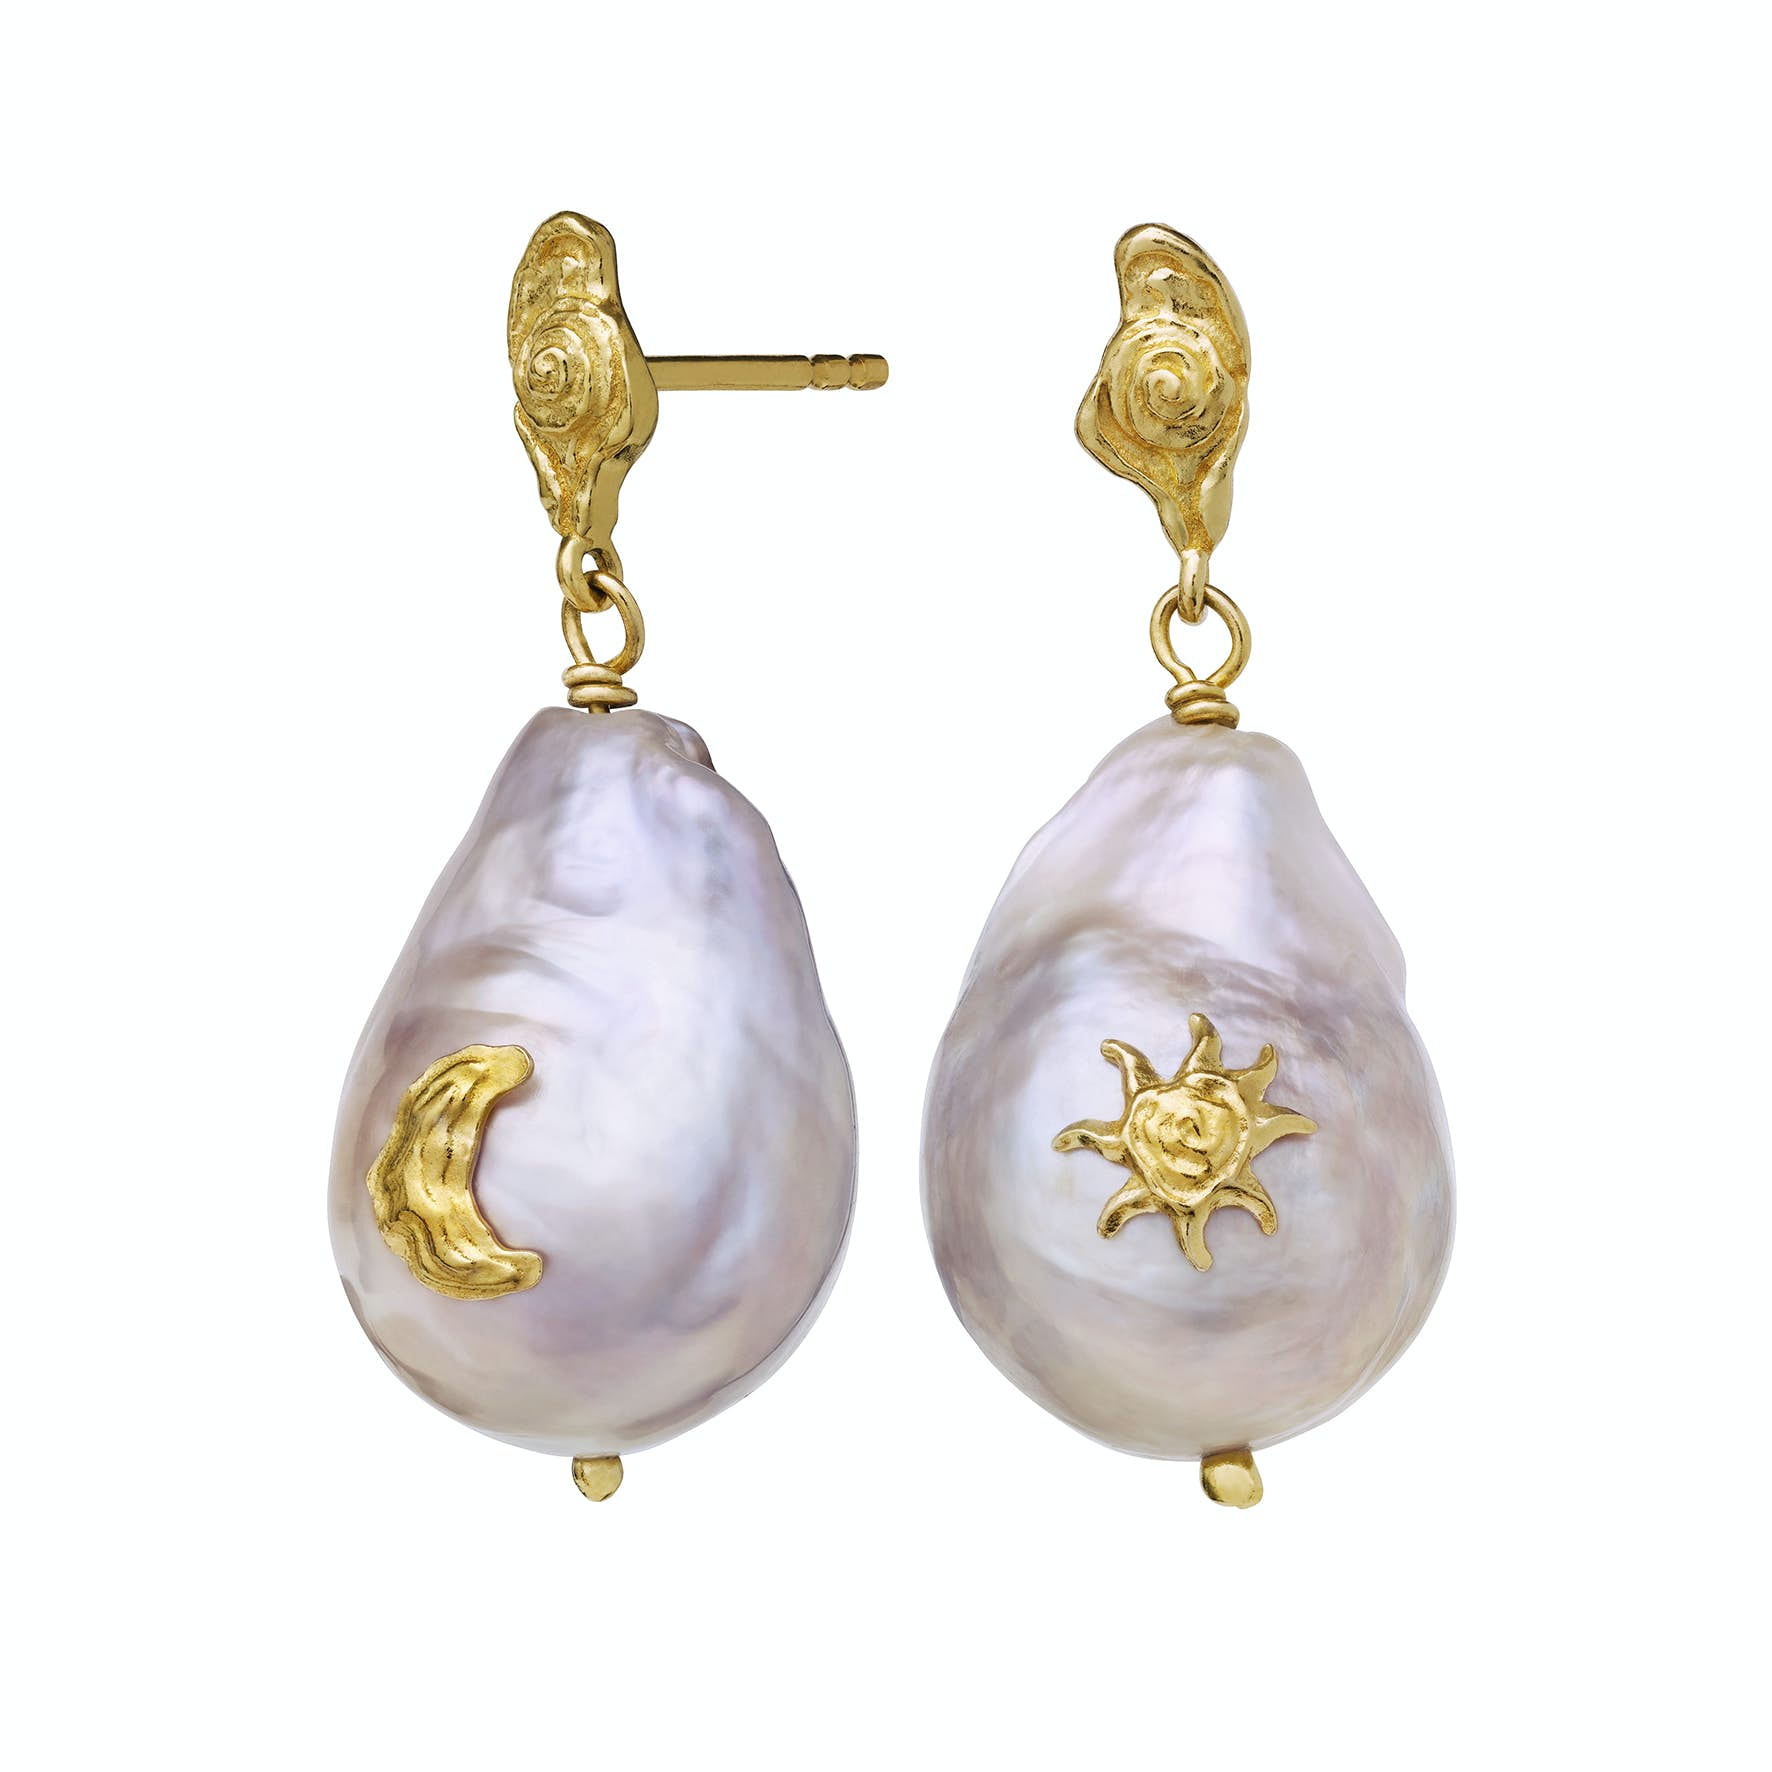 Claire Earrings från Maanesten i Förgyllt-Silver Sterling 925|Freshwater Pearl